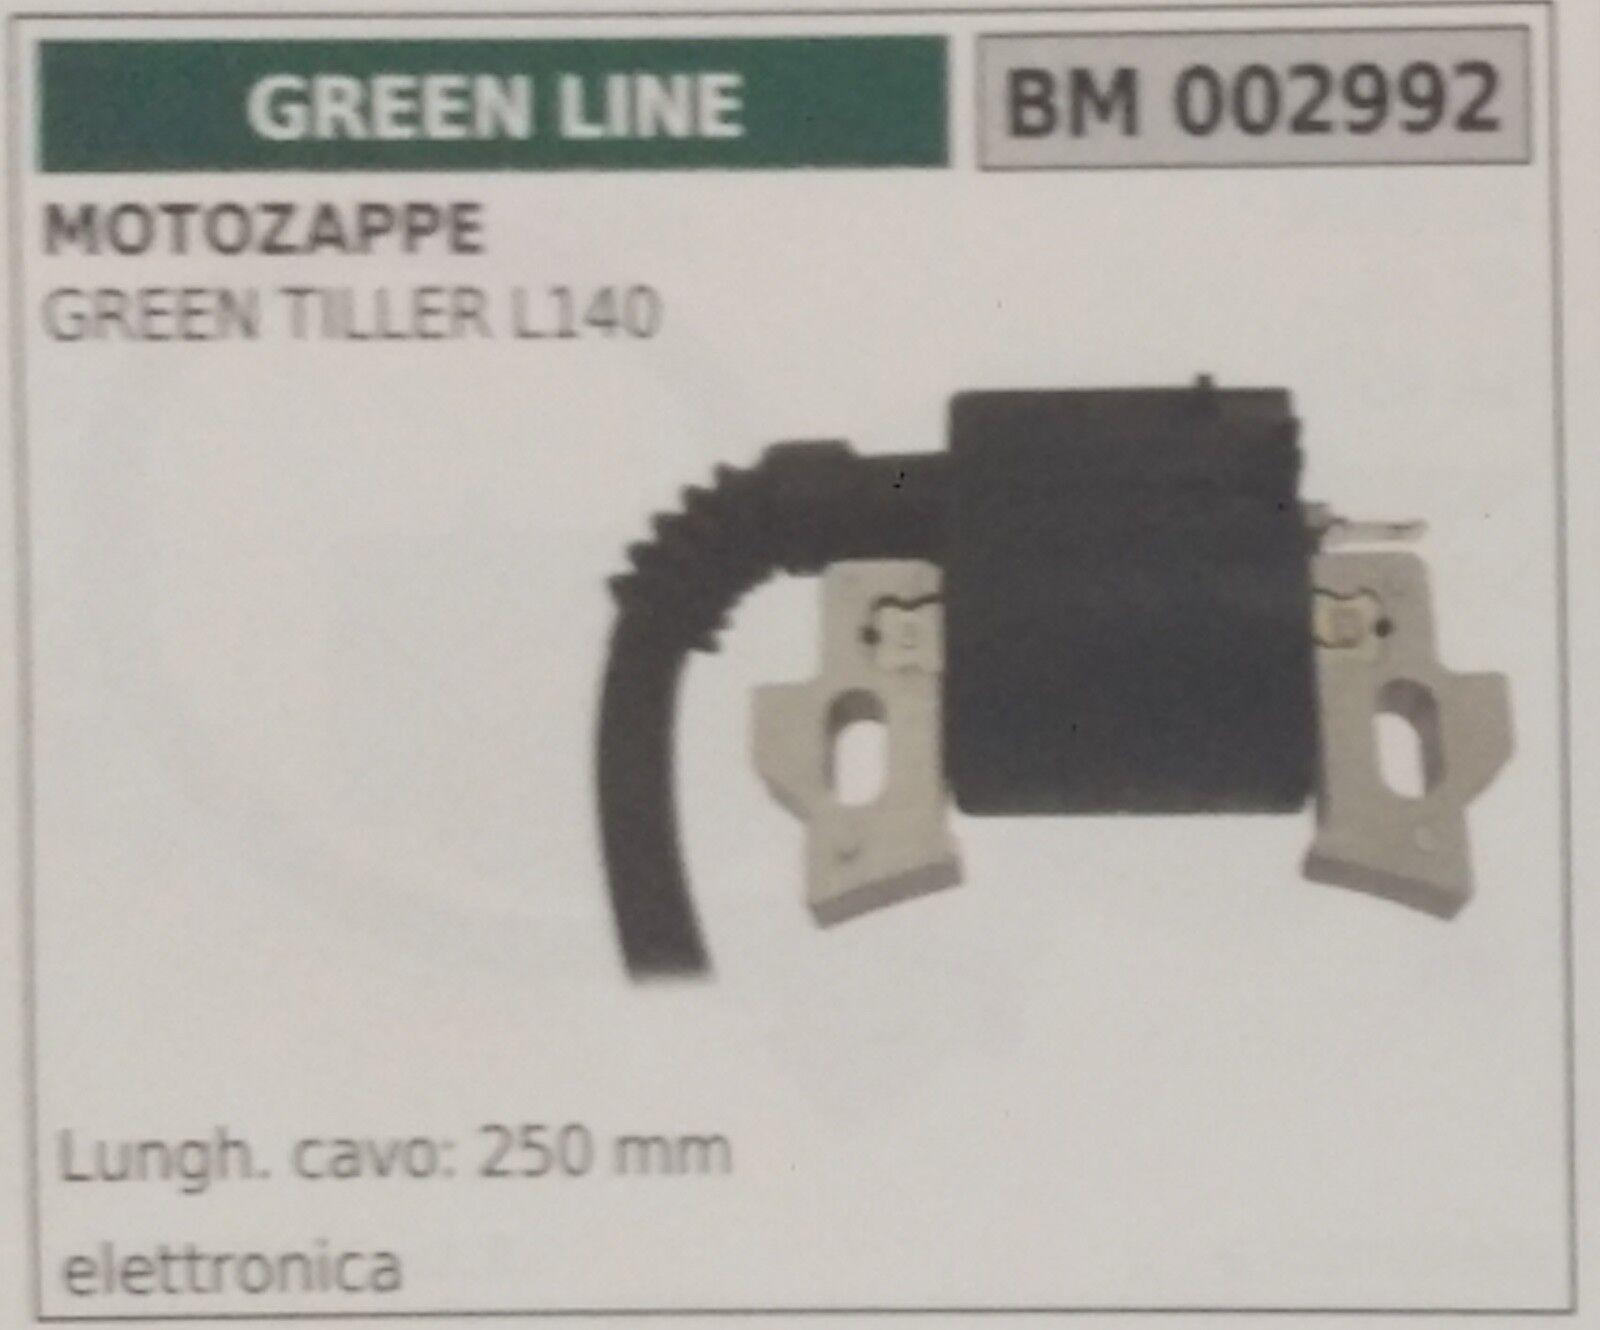 BOBINA ELETTRONICA MOTOZAPPA motozappe verde LINE verde TILLER L140